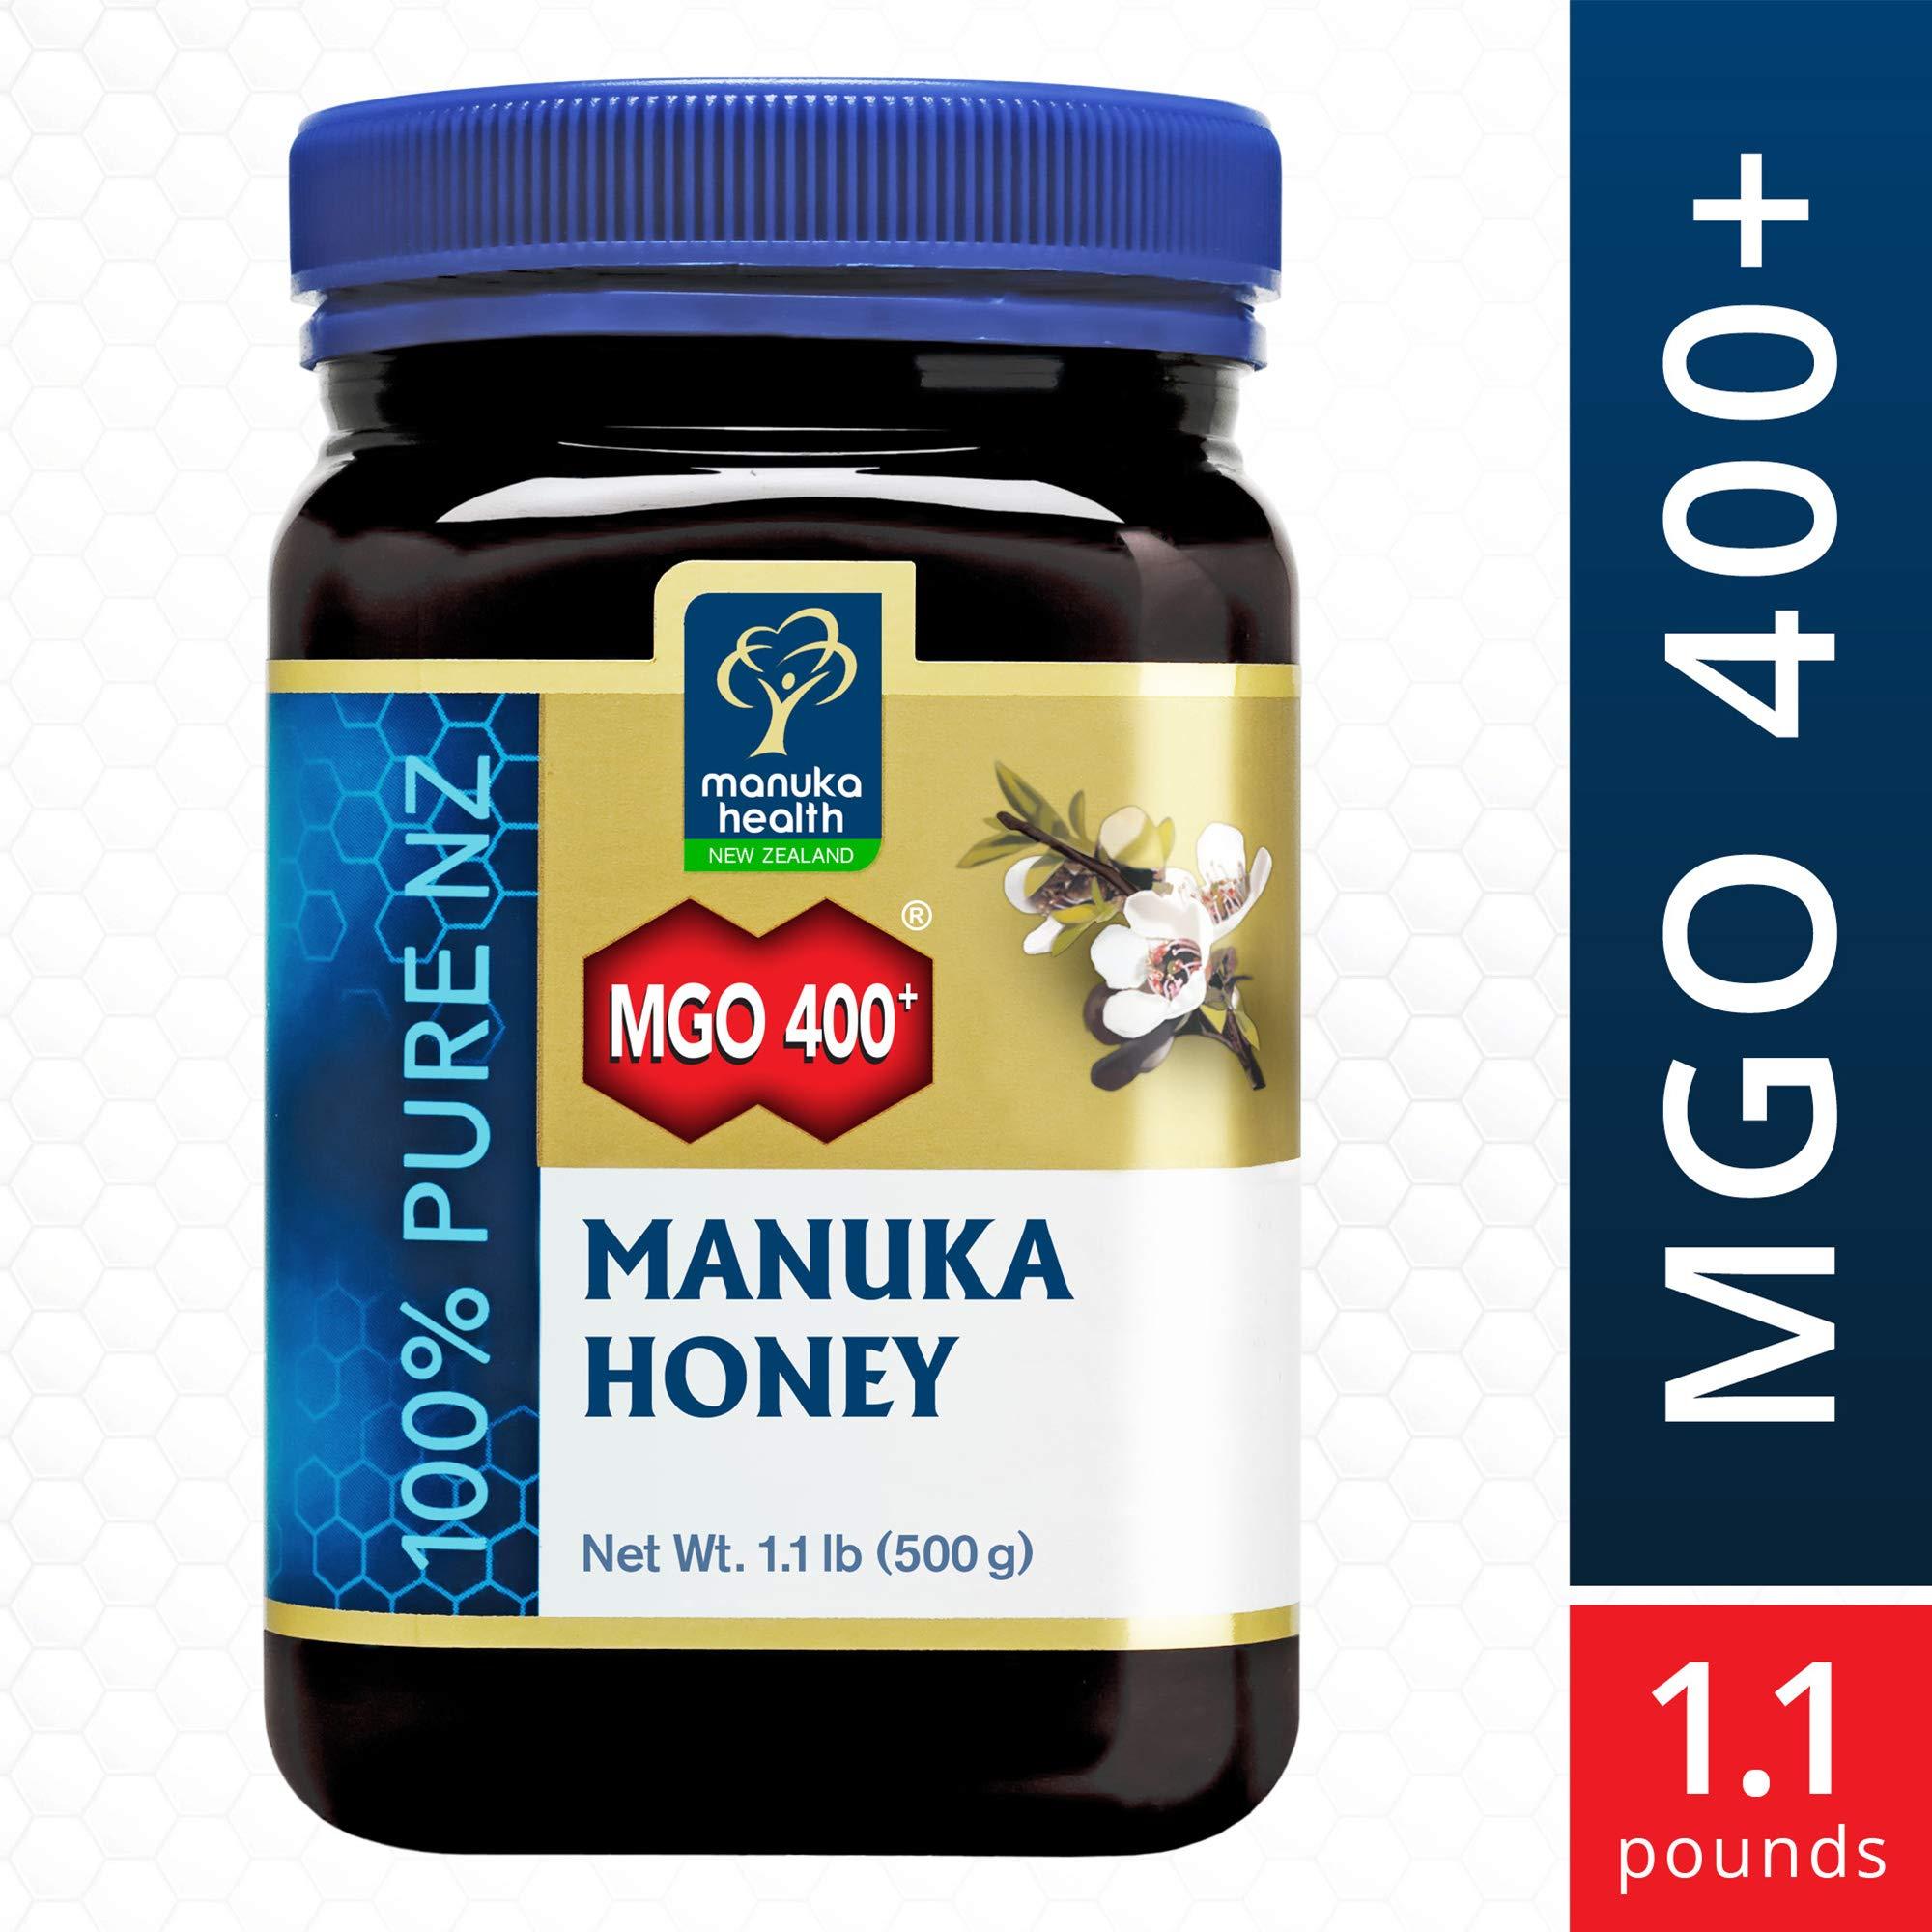 Manuka Health - MGO 400+ Manuka Honey, 100% Pure New Zealand Honey, 1.1 lbs by Manuka Health (Image #1)